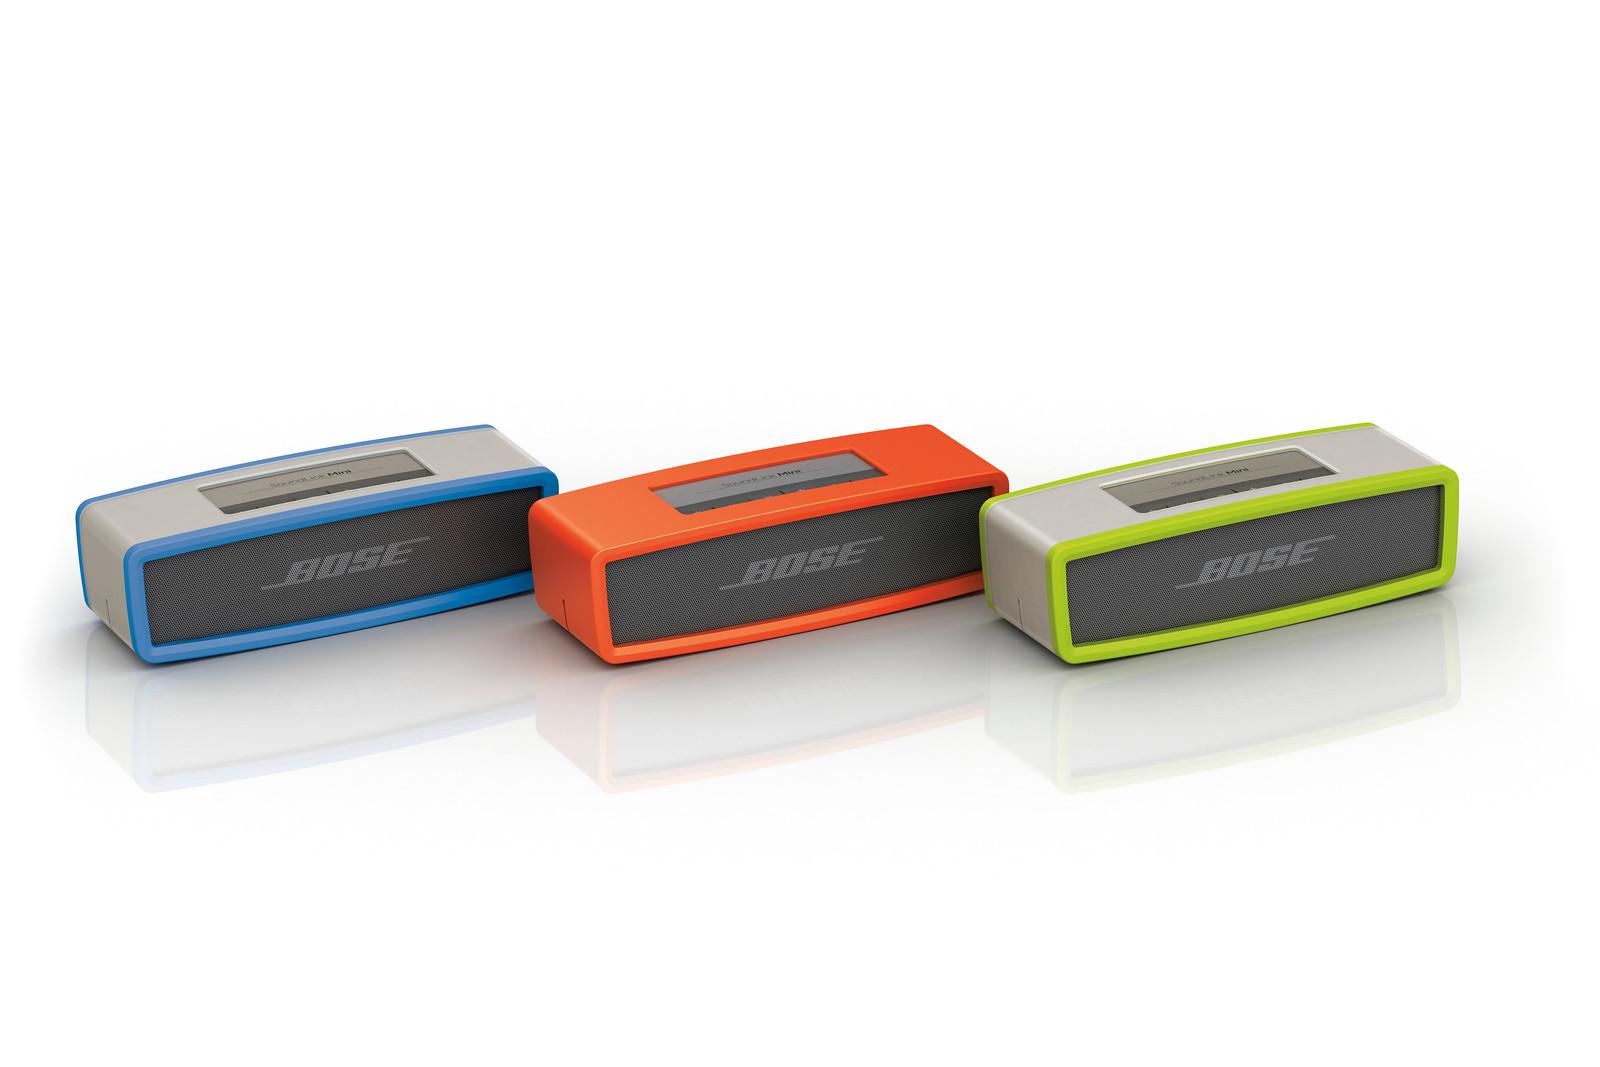 300 soundlink mini bumpers rgb X3